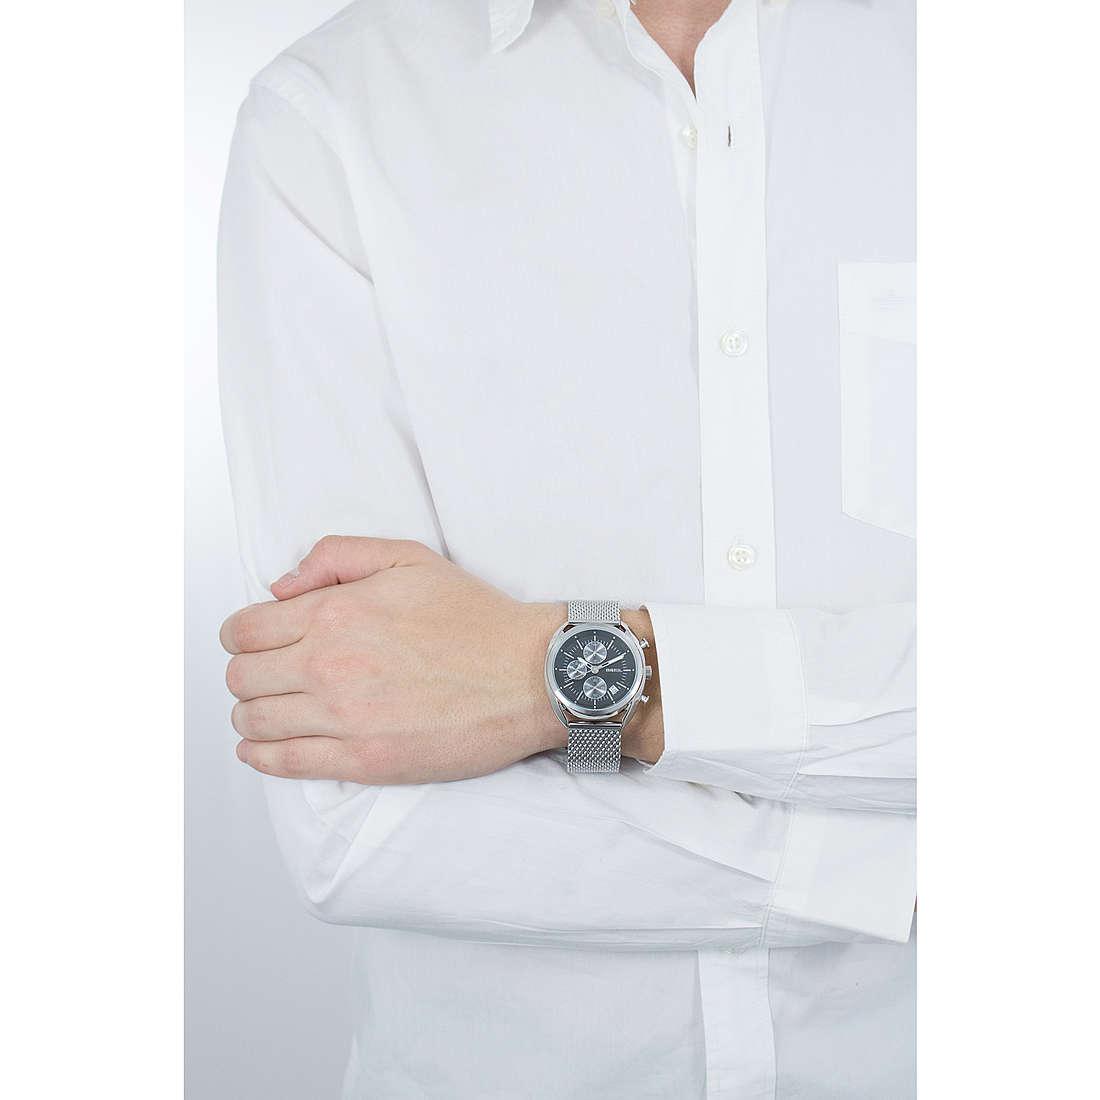 Breil chronographs Beaubourg Extension man TW1513 photo wearing